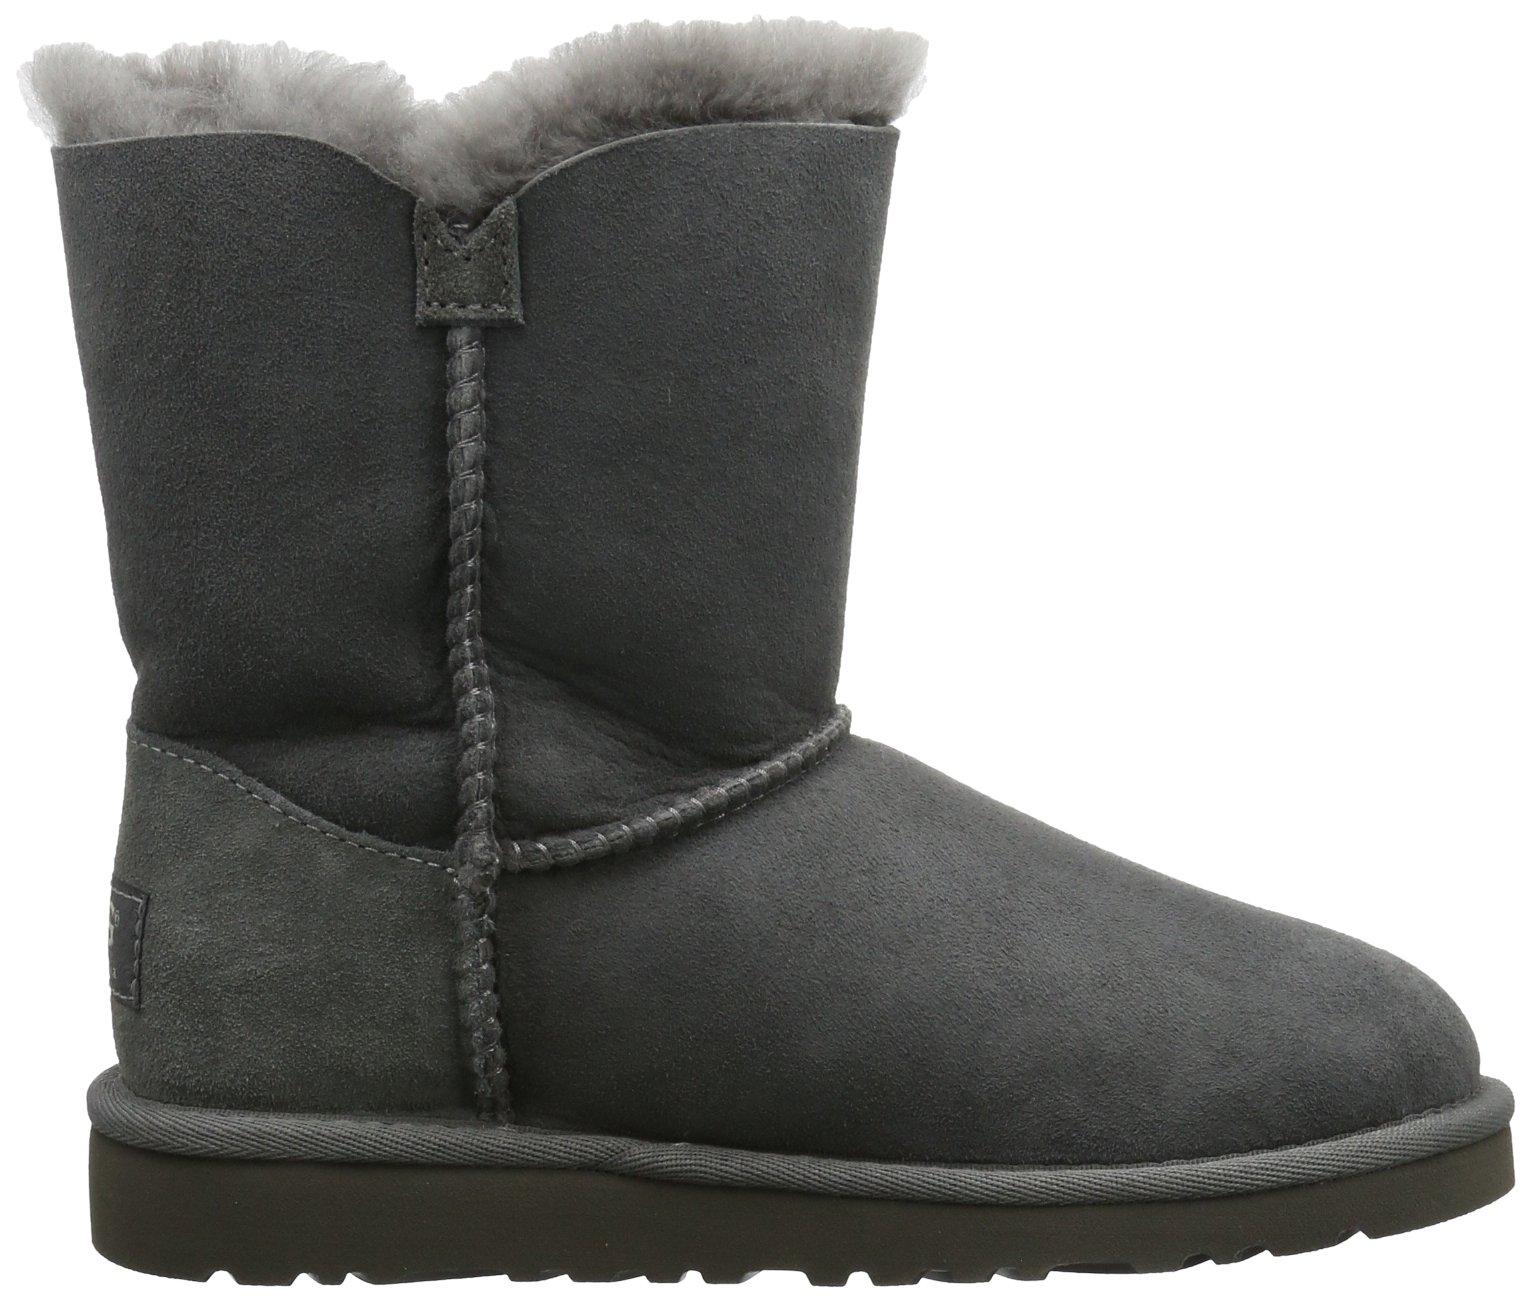 Ugg Australia Bailey Button Girls' Boots, gris (Grigio (grey)), 9 UK Child by UGG (Image #6)